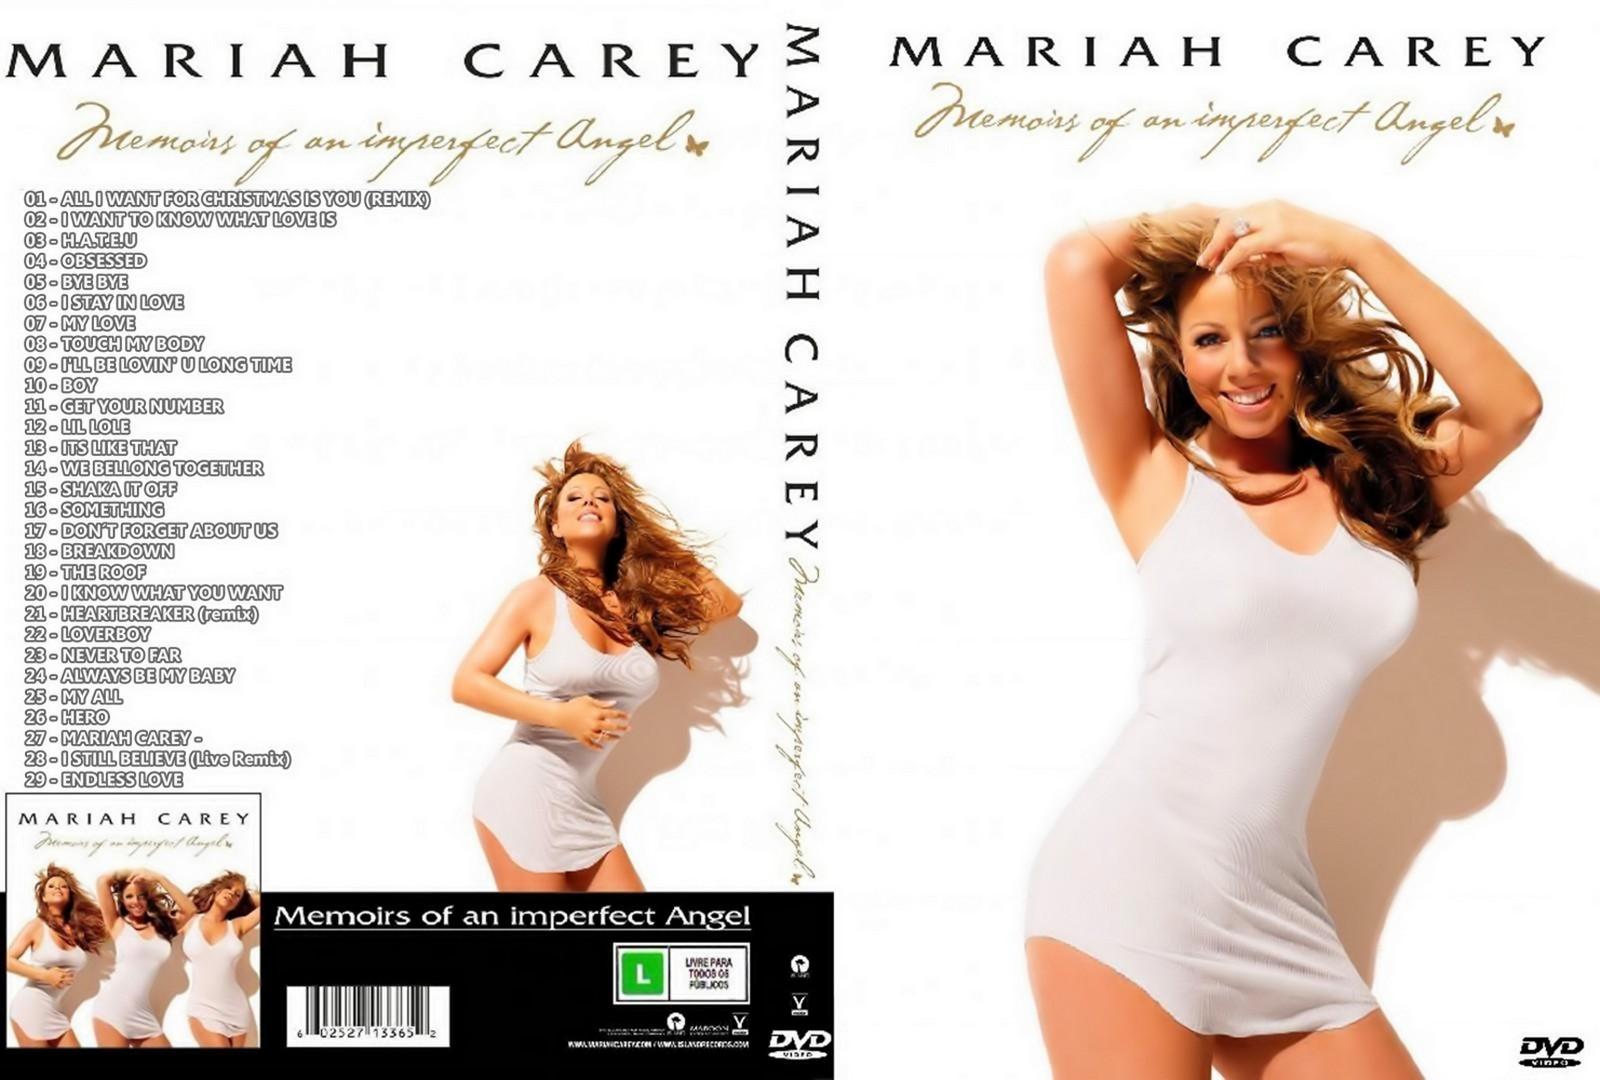 http://1.bp.blogspot.com/_NlKBeuXrvPE/TLns4RnQ3EI/AAAAAAAABK8/fRcg1B1IgWw/s1600/Mariah-Carey-Memoirs-Of-An-Imperfect-Angel.jpg